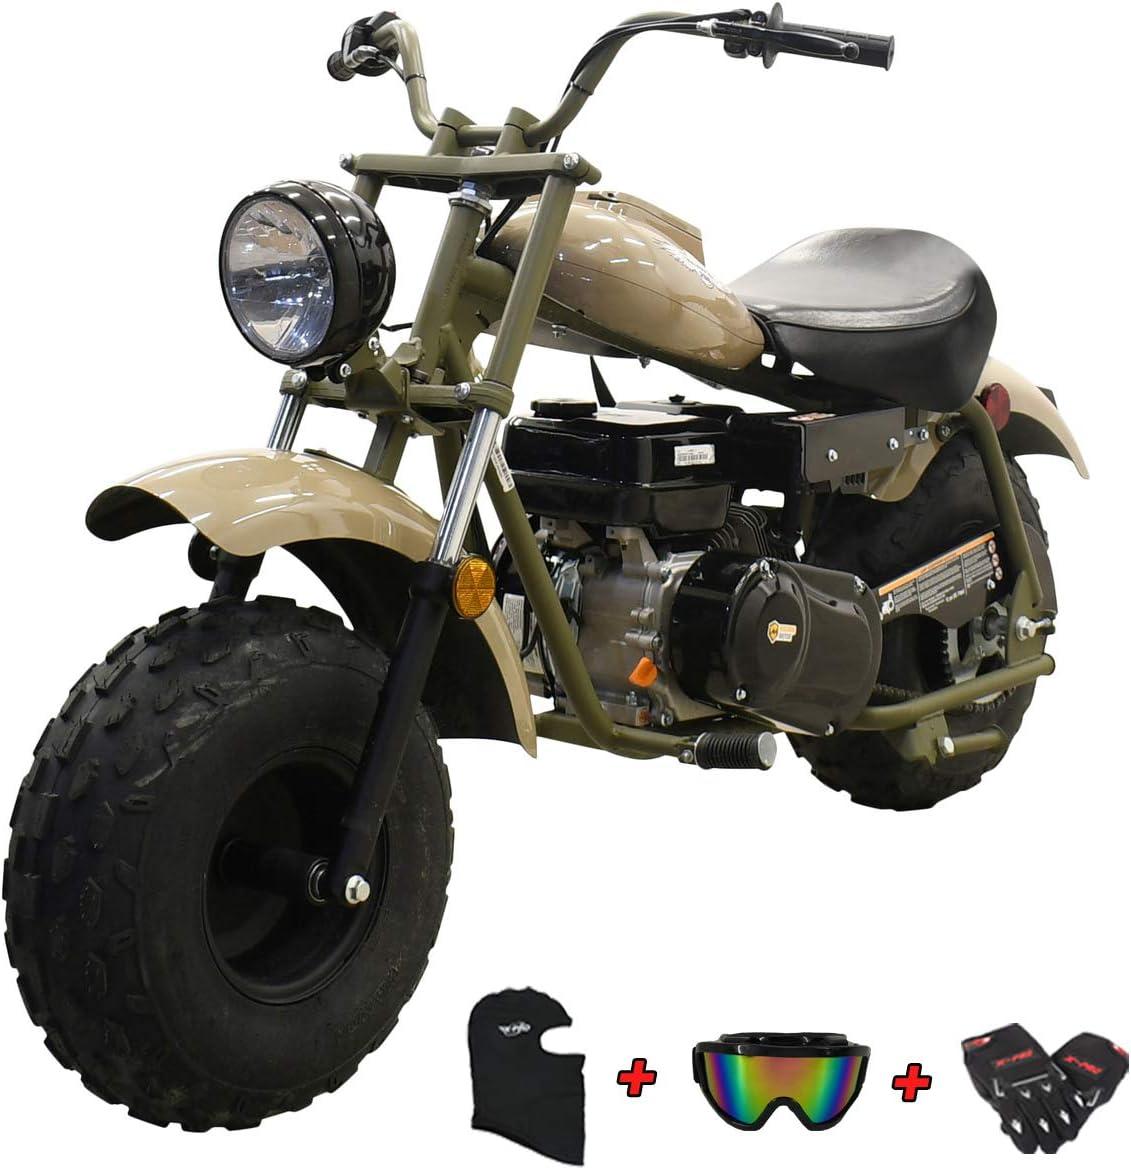 Supersized 196CC Youth Mini Bike